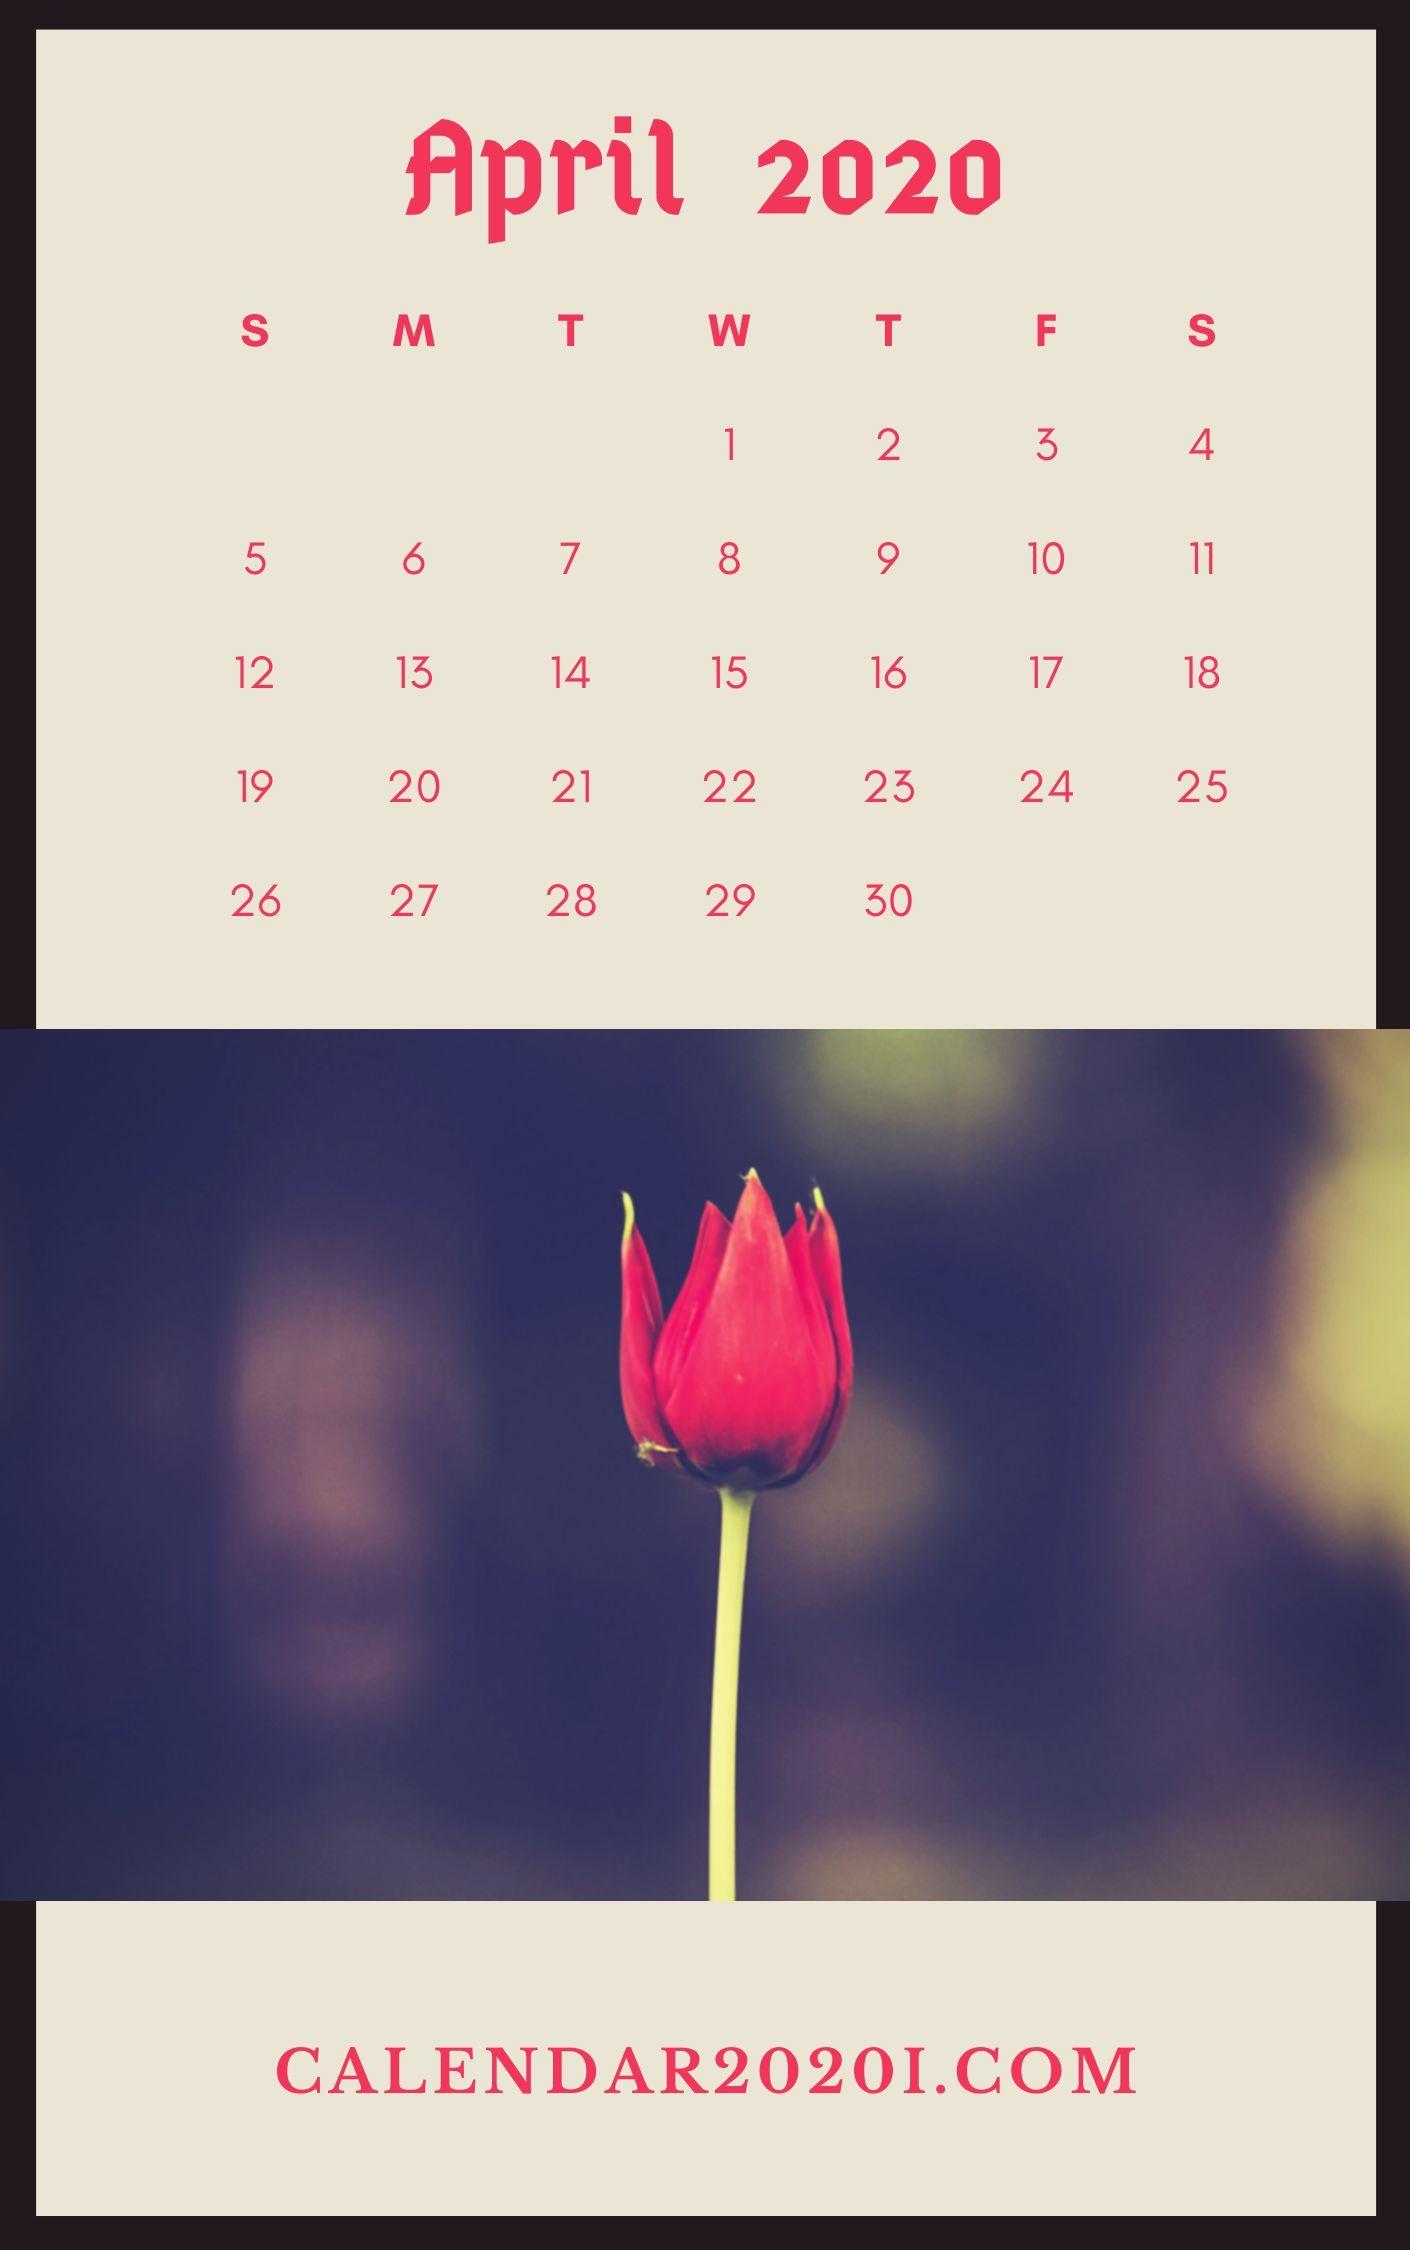 Birth Month Flower Grow Kit Garden Gifts, Birthday Gifts